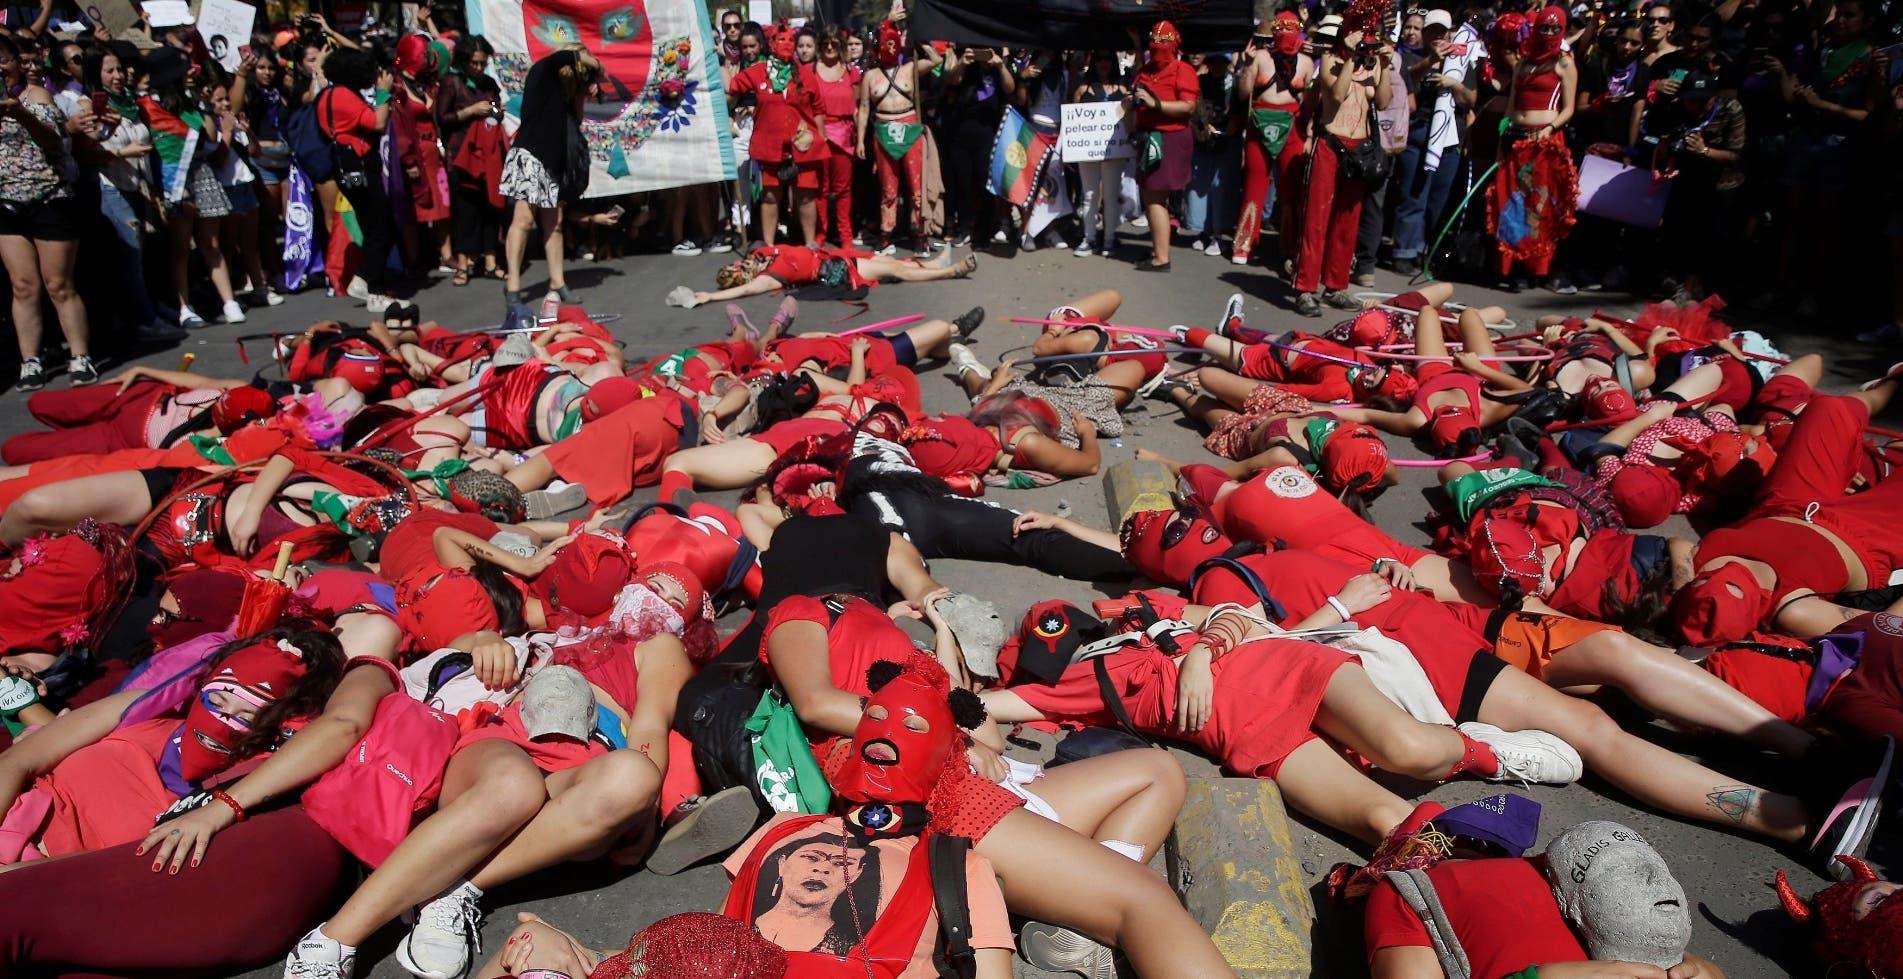 Latinoamericanas se unen contra ola de  feminicidios